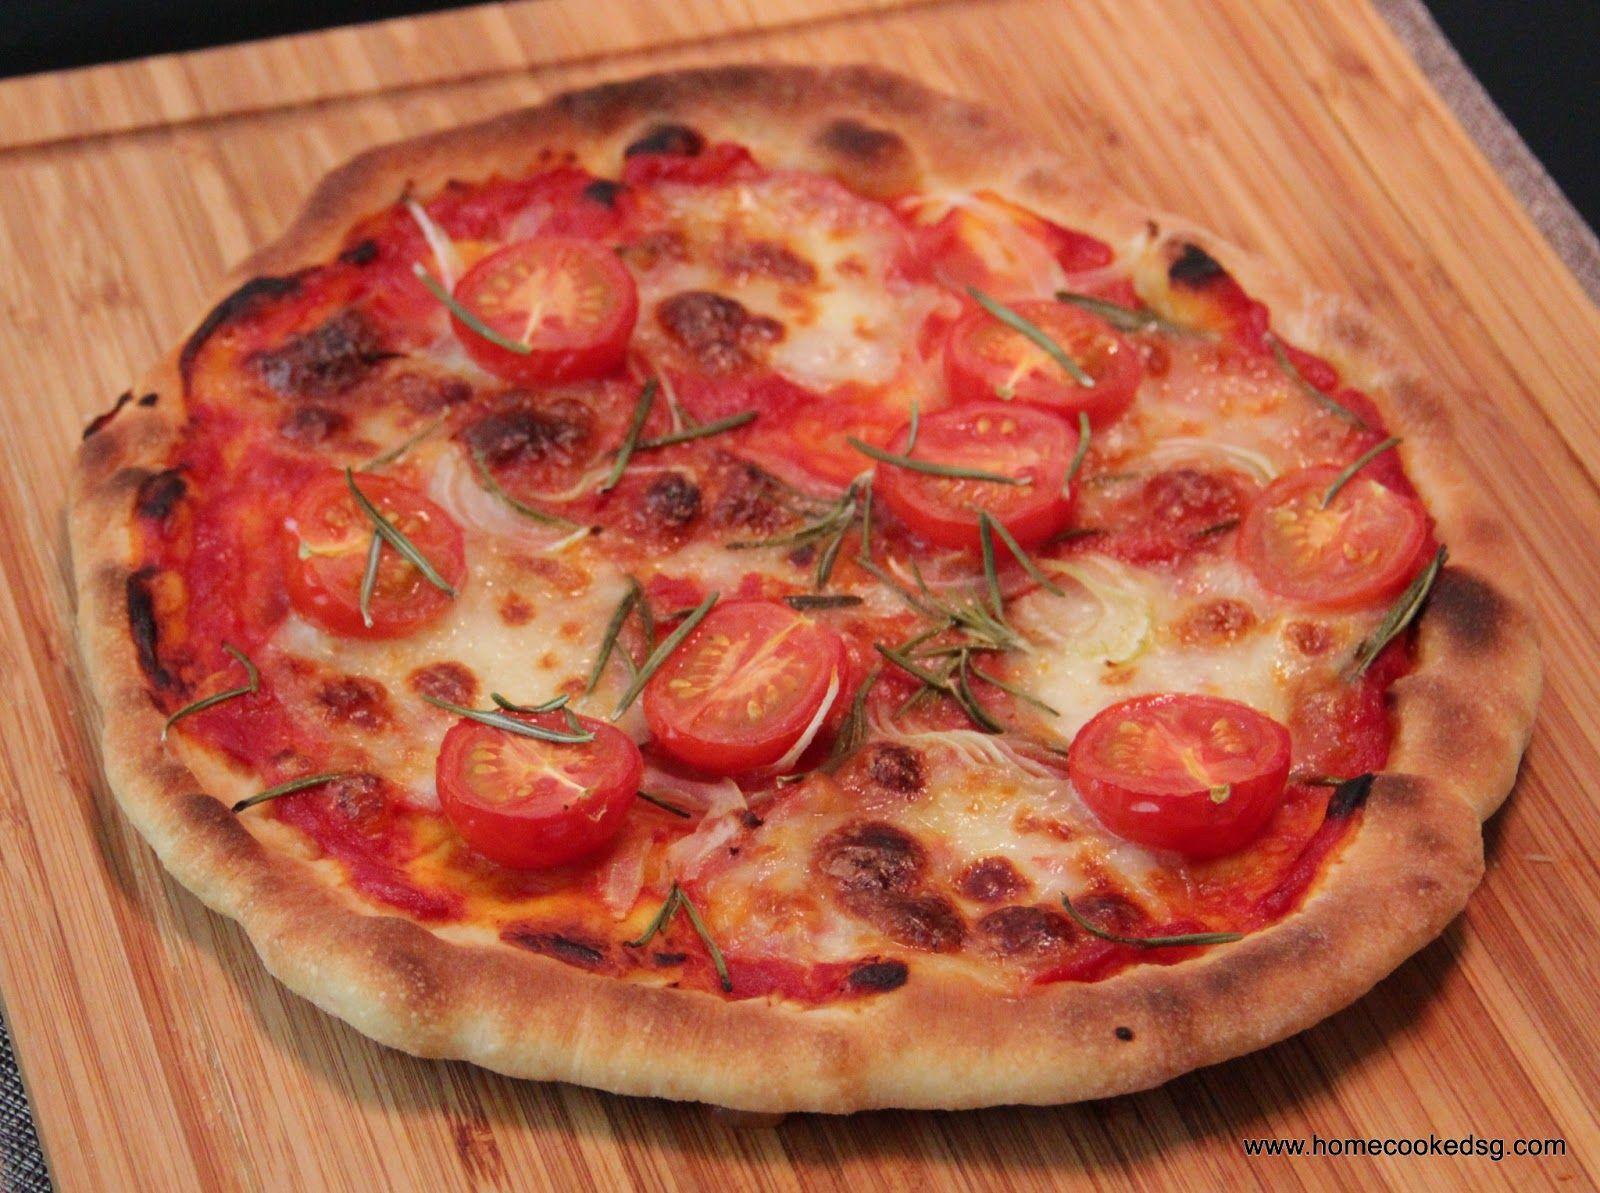 Home cooked sg tomato rosemary pizza gordon ramsay